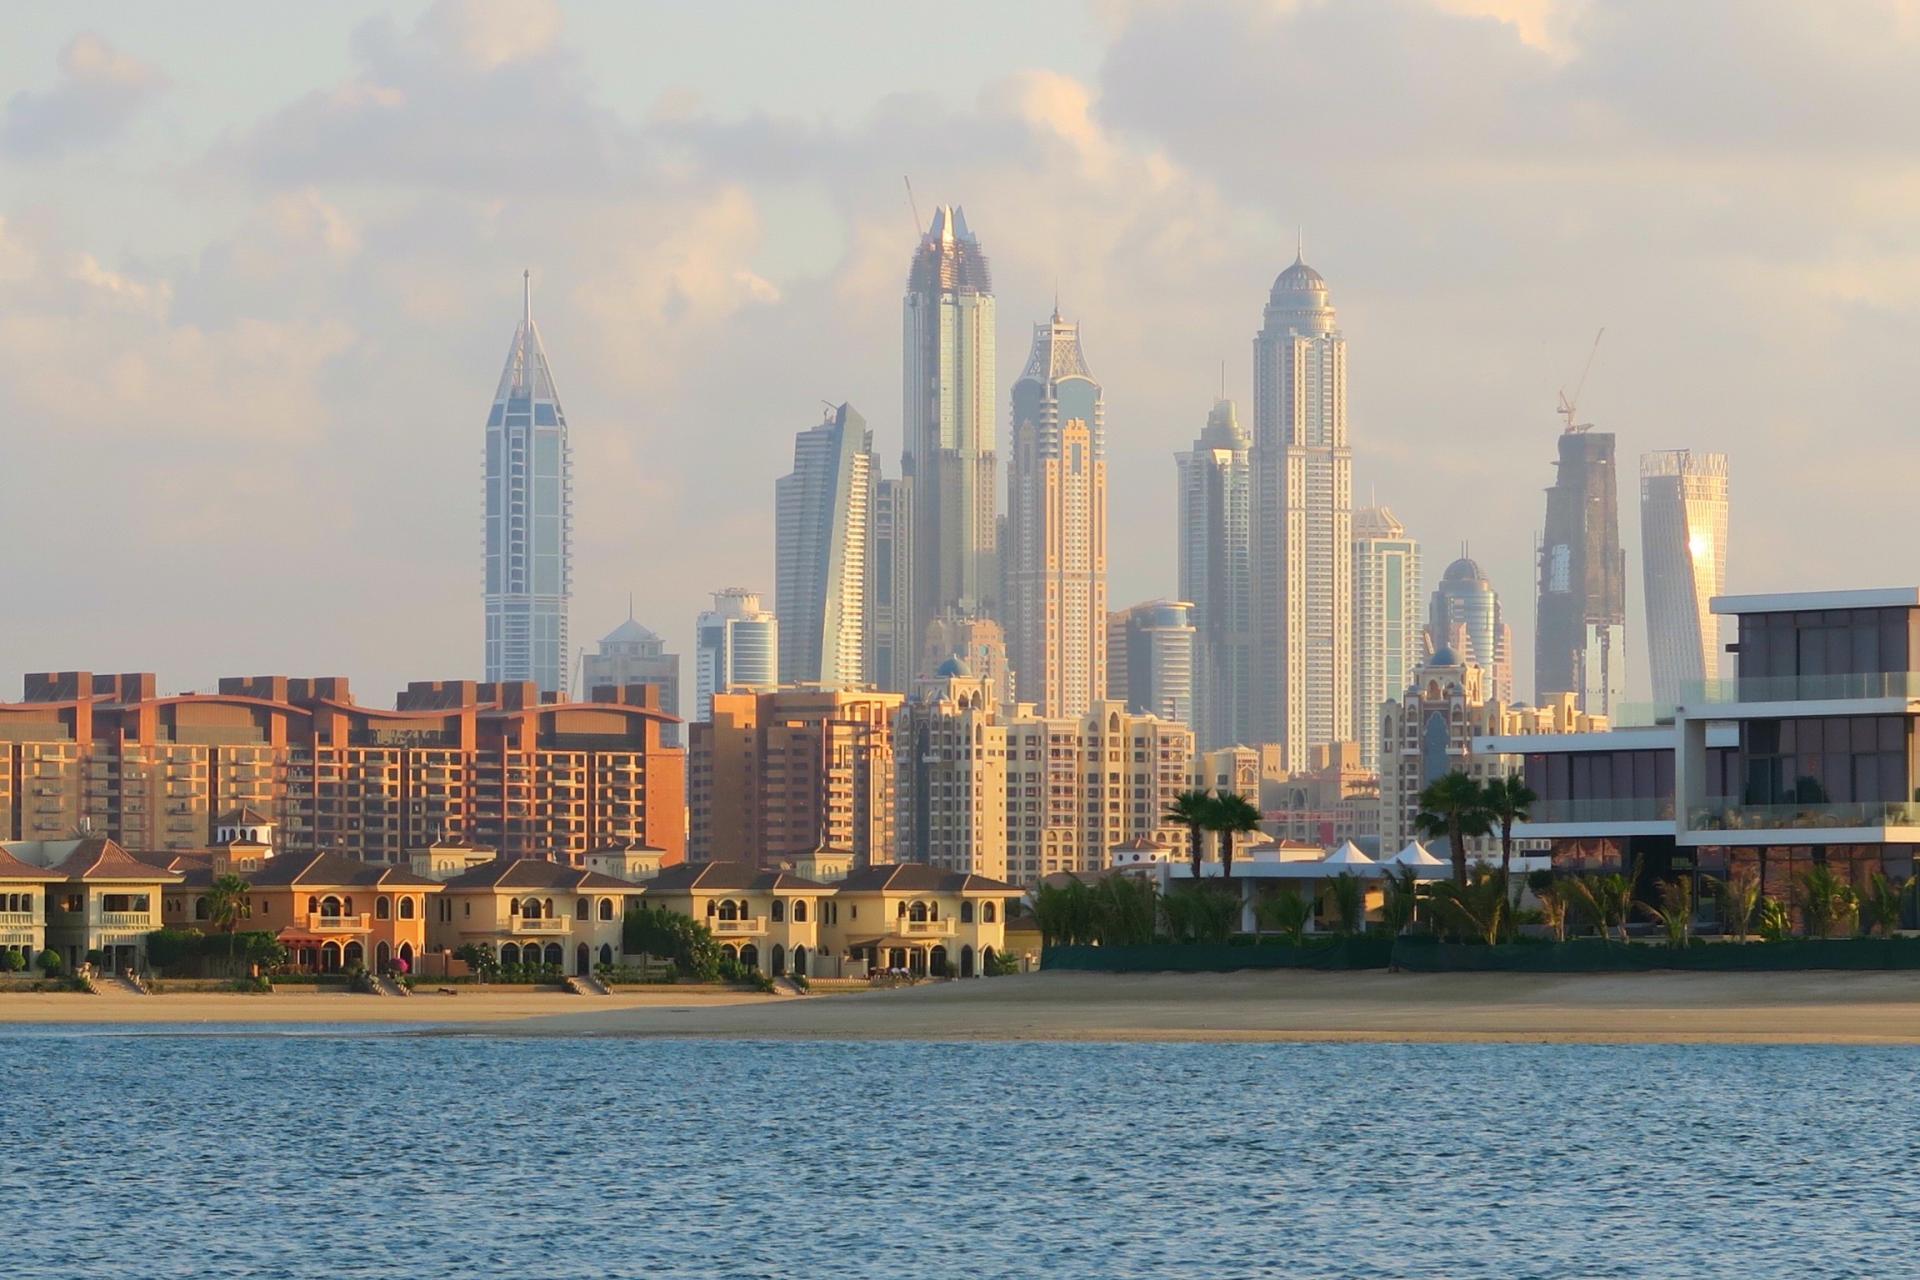 Sofitel Dubai The Palm Beach view